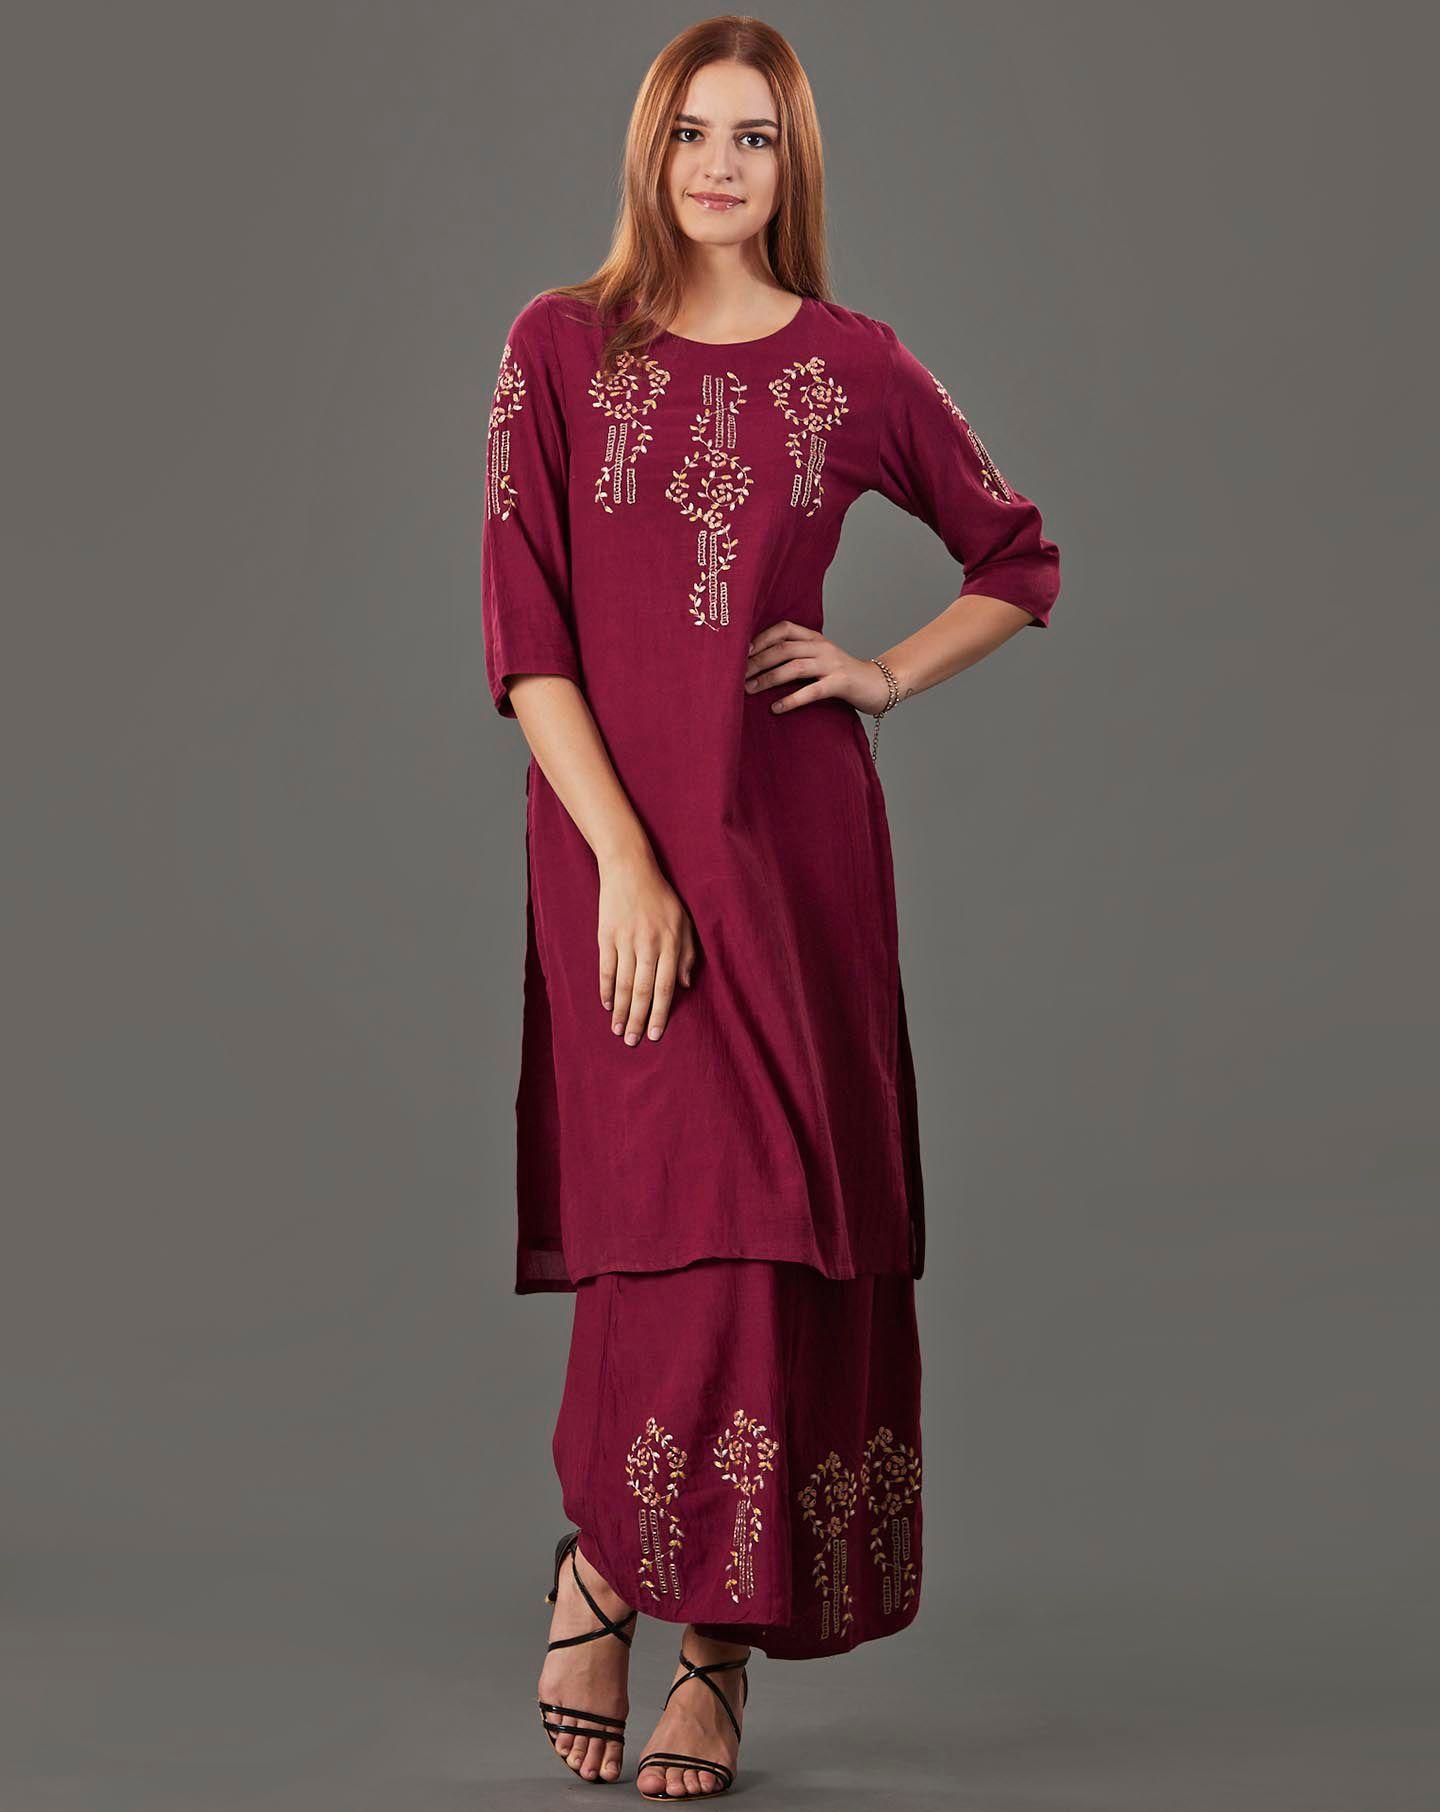 Maroon Embroidered Cotton Silk Kurta with Flared Palazzo - Set of 2